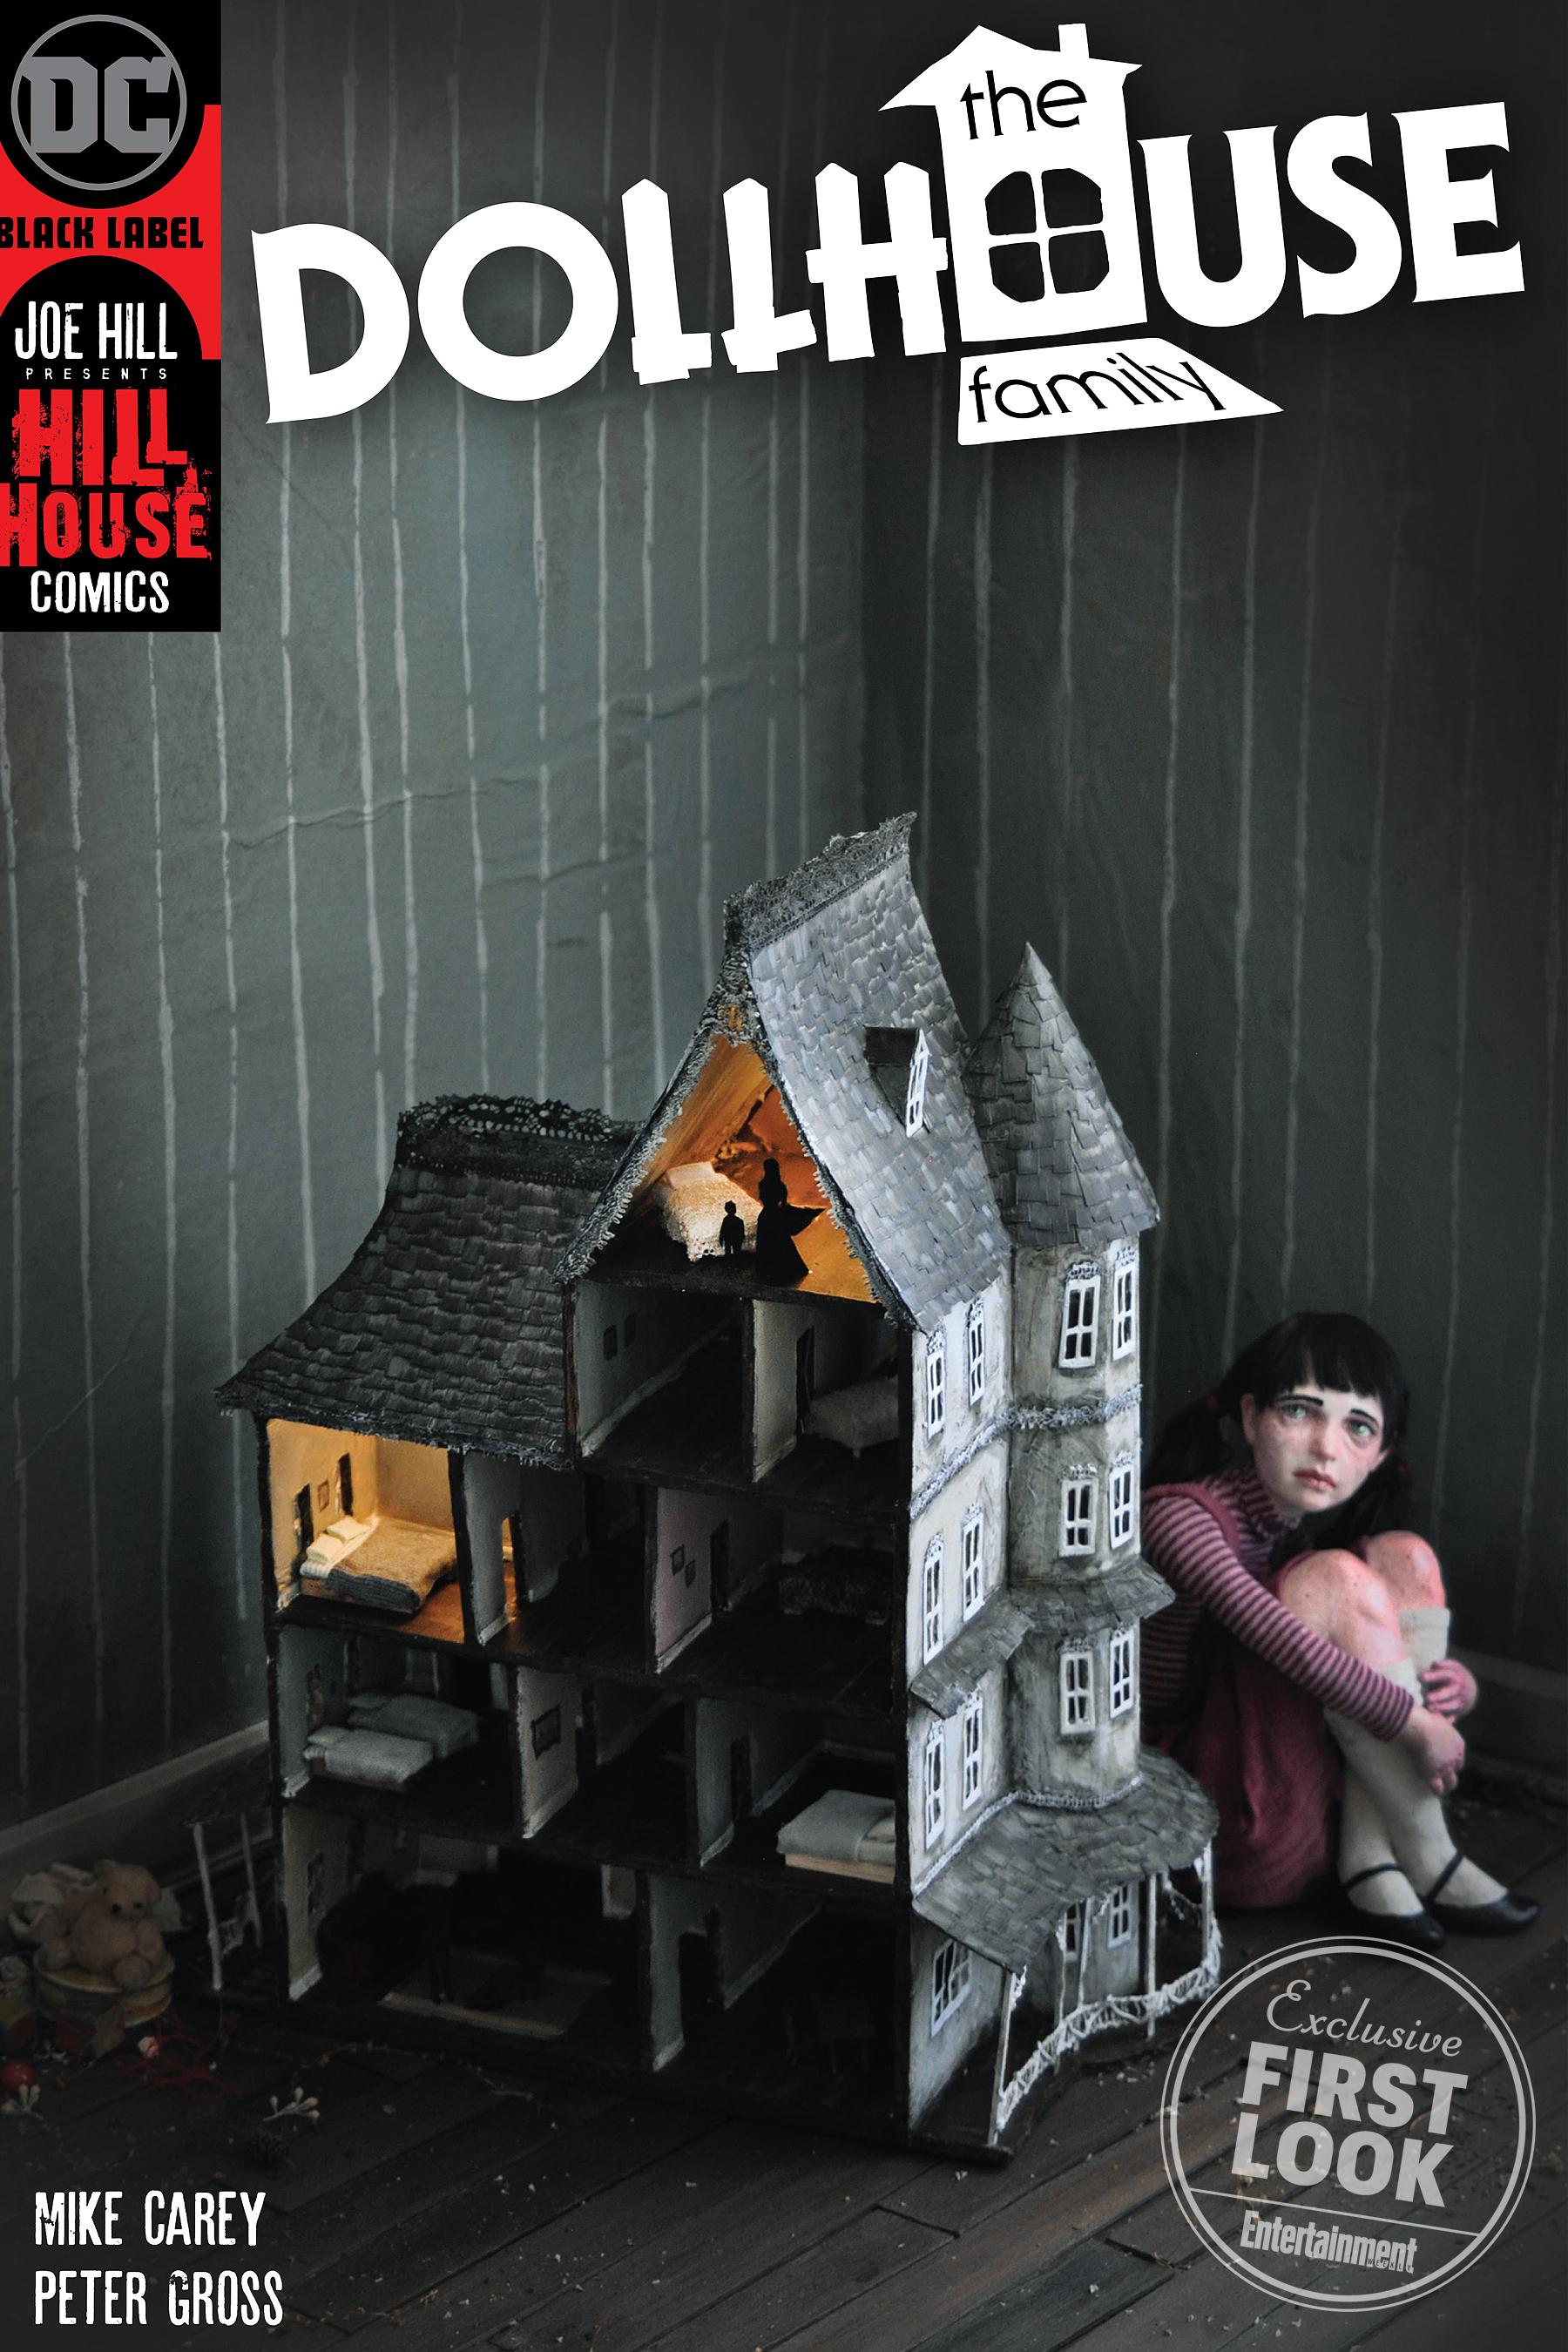 hill-house-comics-2.jpg